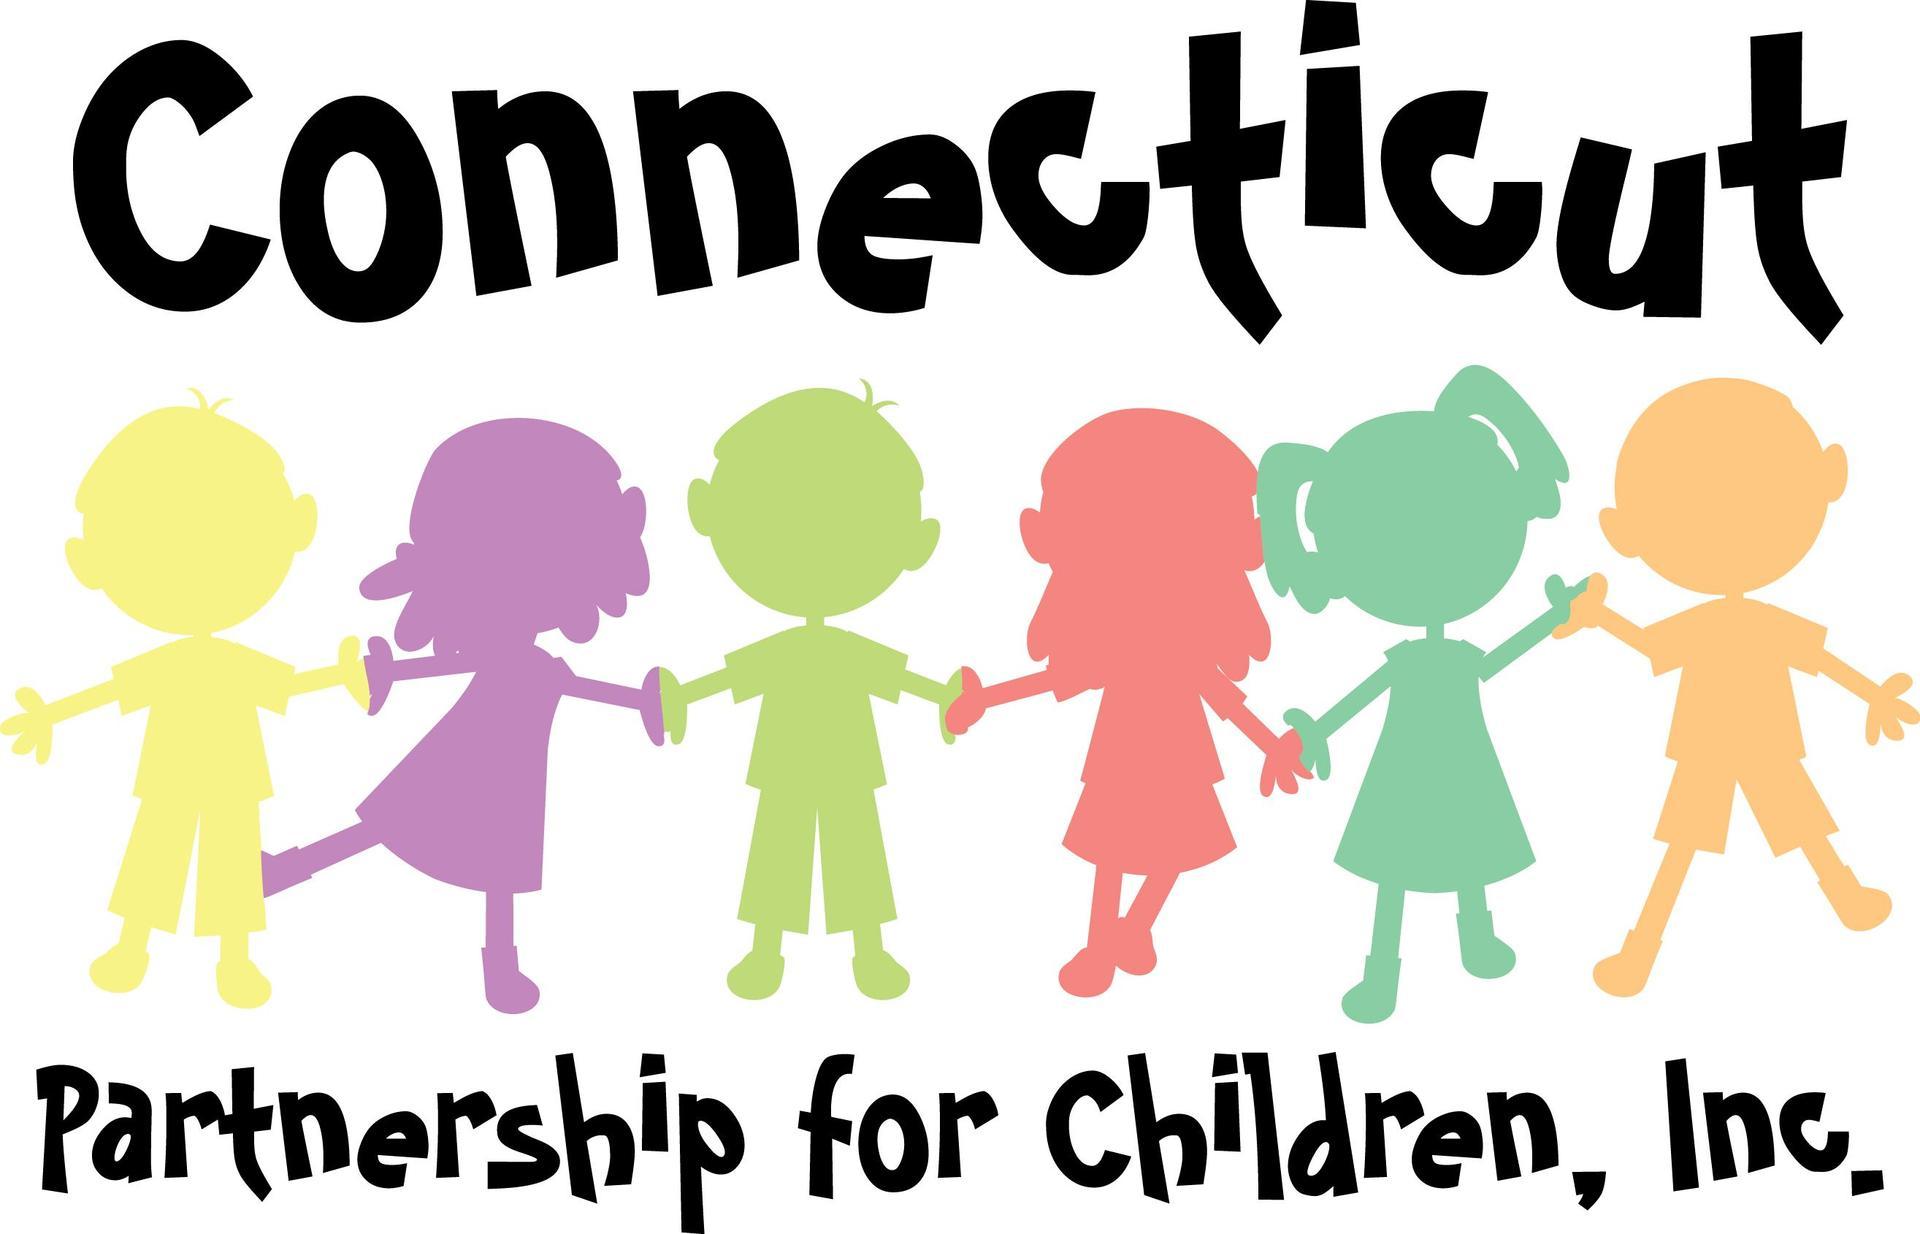 CT Partnership for Children Inc